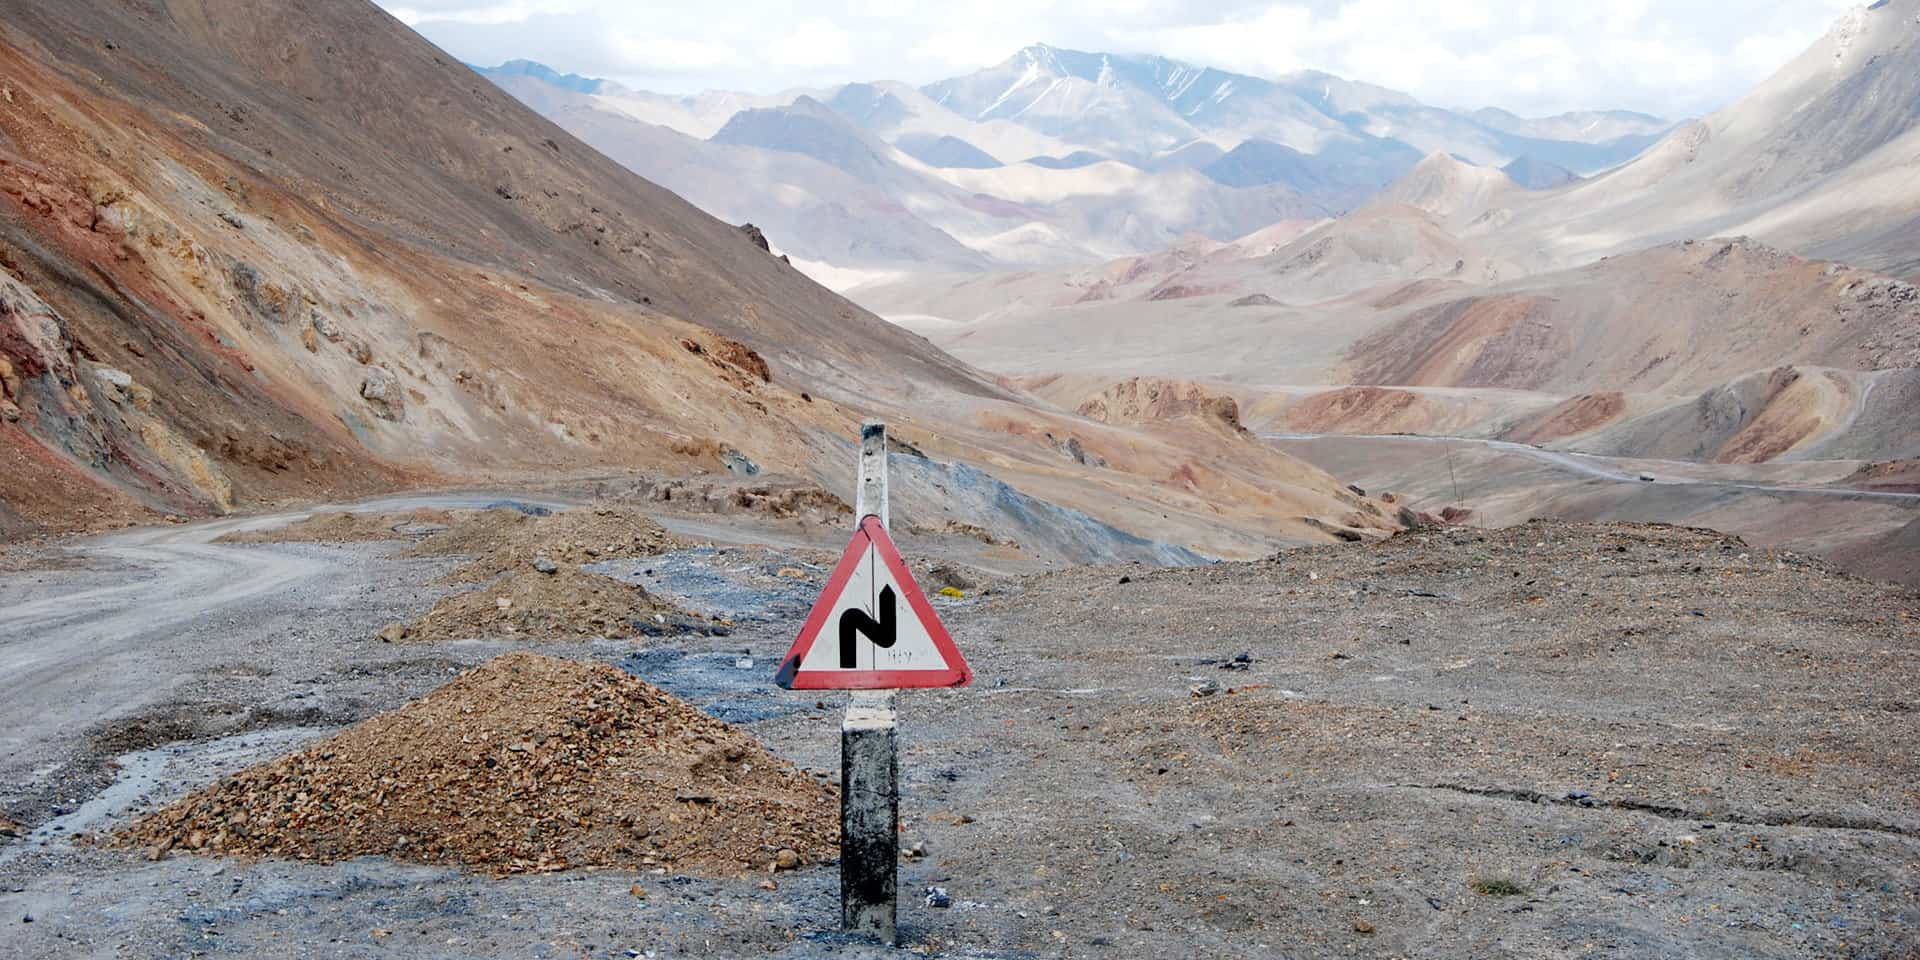 Hårnålesving på Pamir Highway